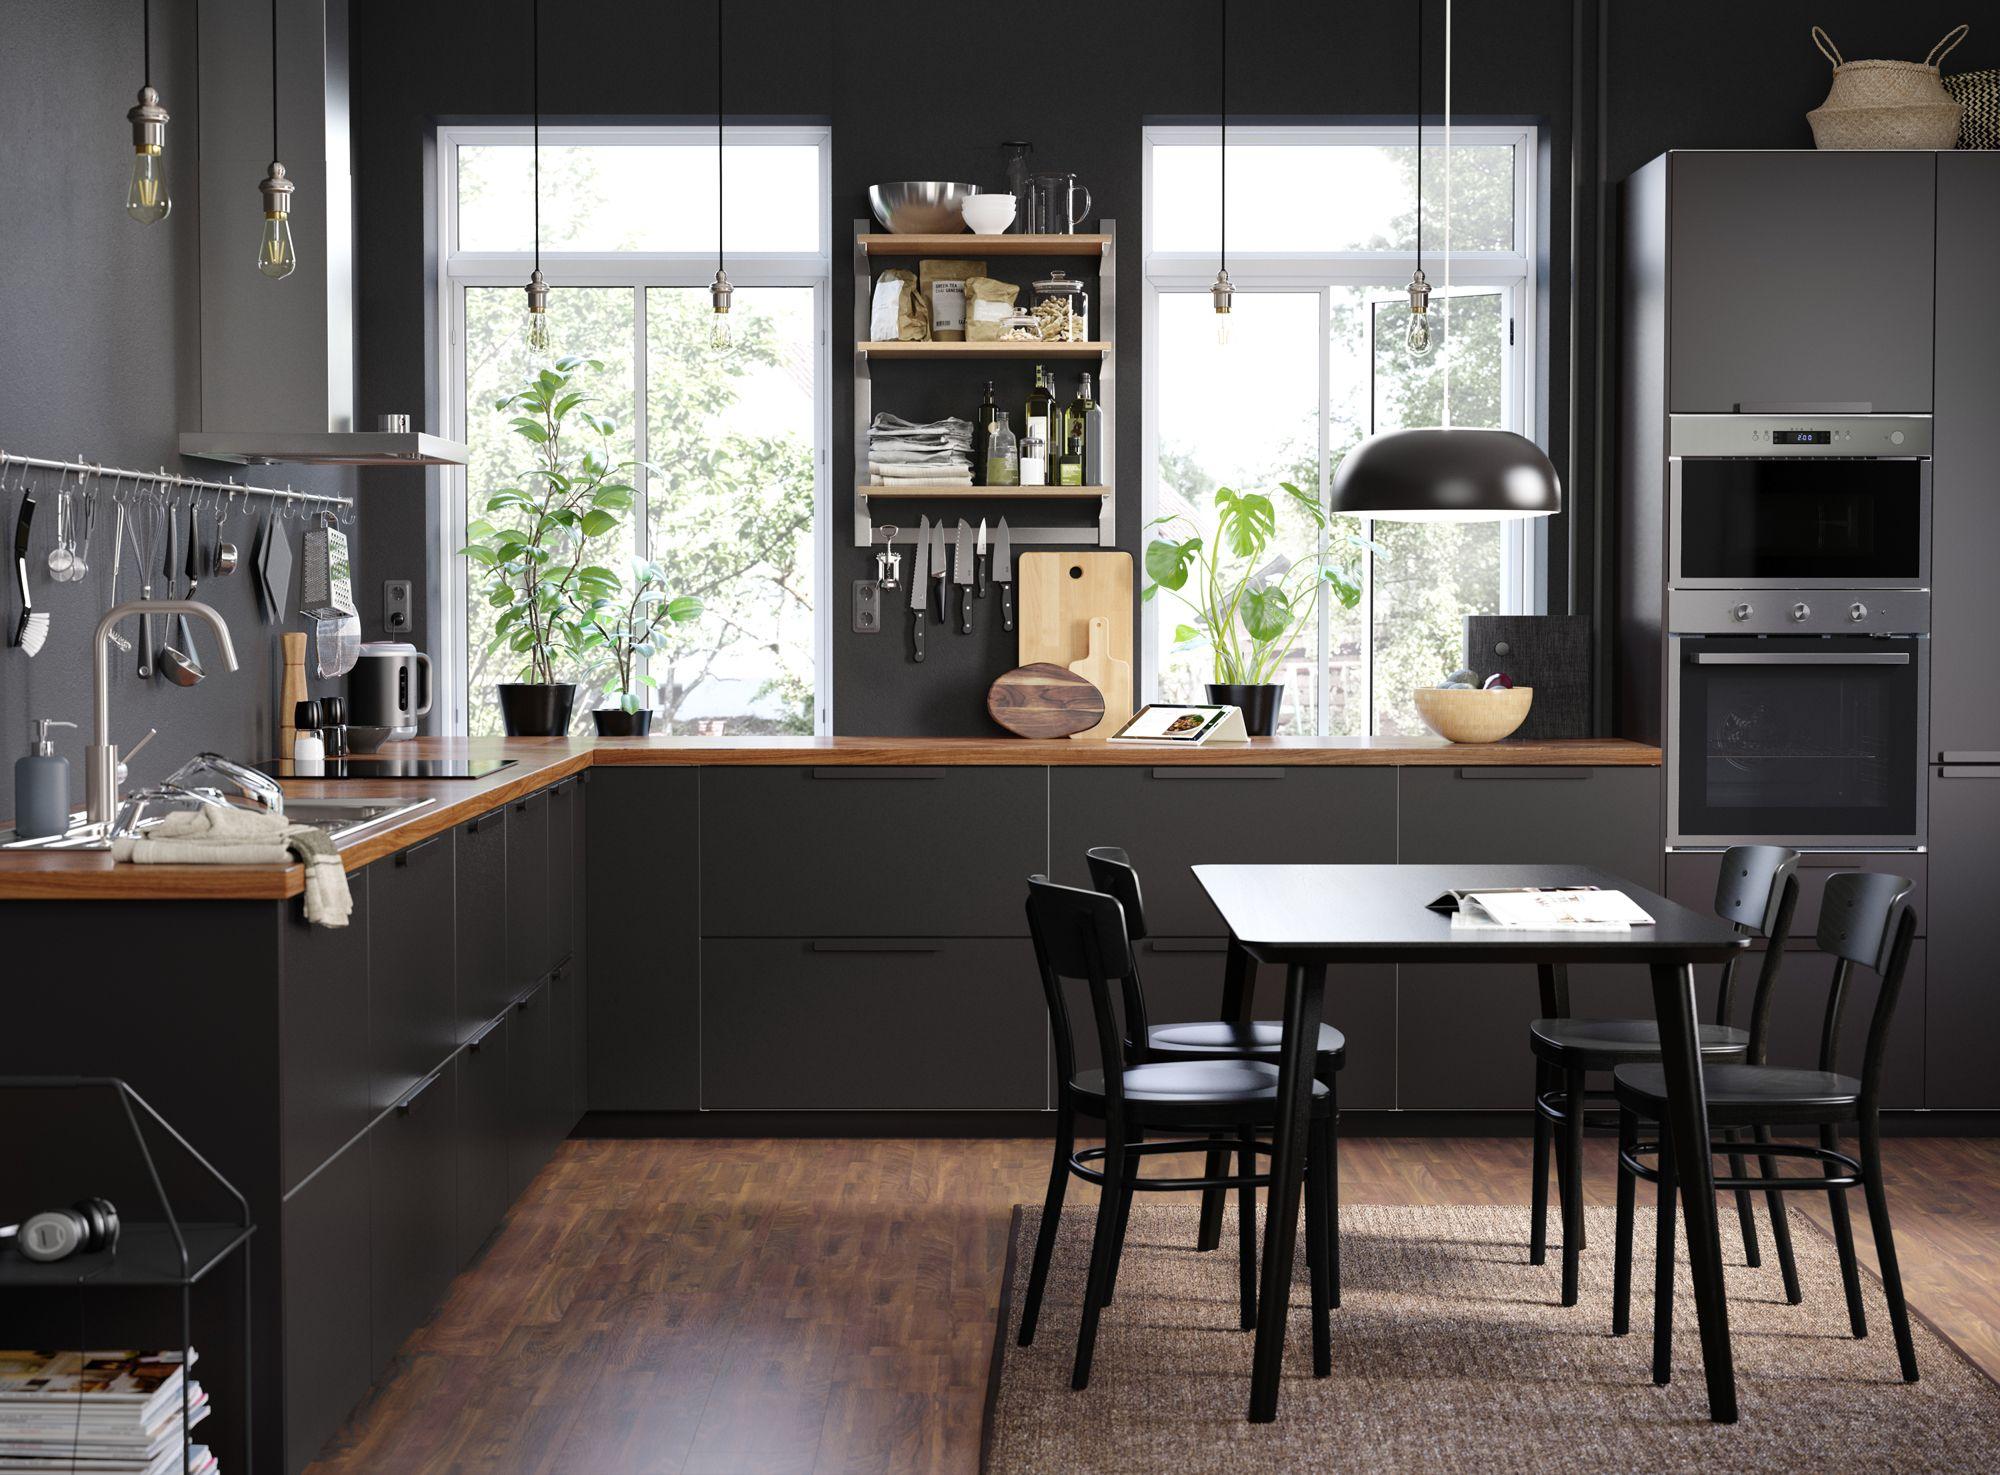 Ikea Kungsbacka Google Search In 2020 Ikea Kitchen Inspiration Kitchen Inspirations Kitchen Interior